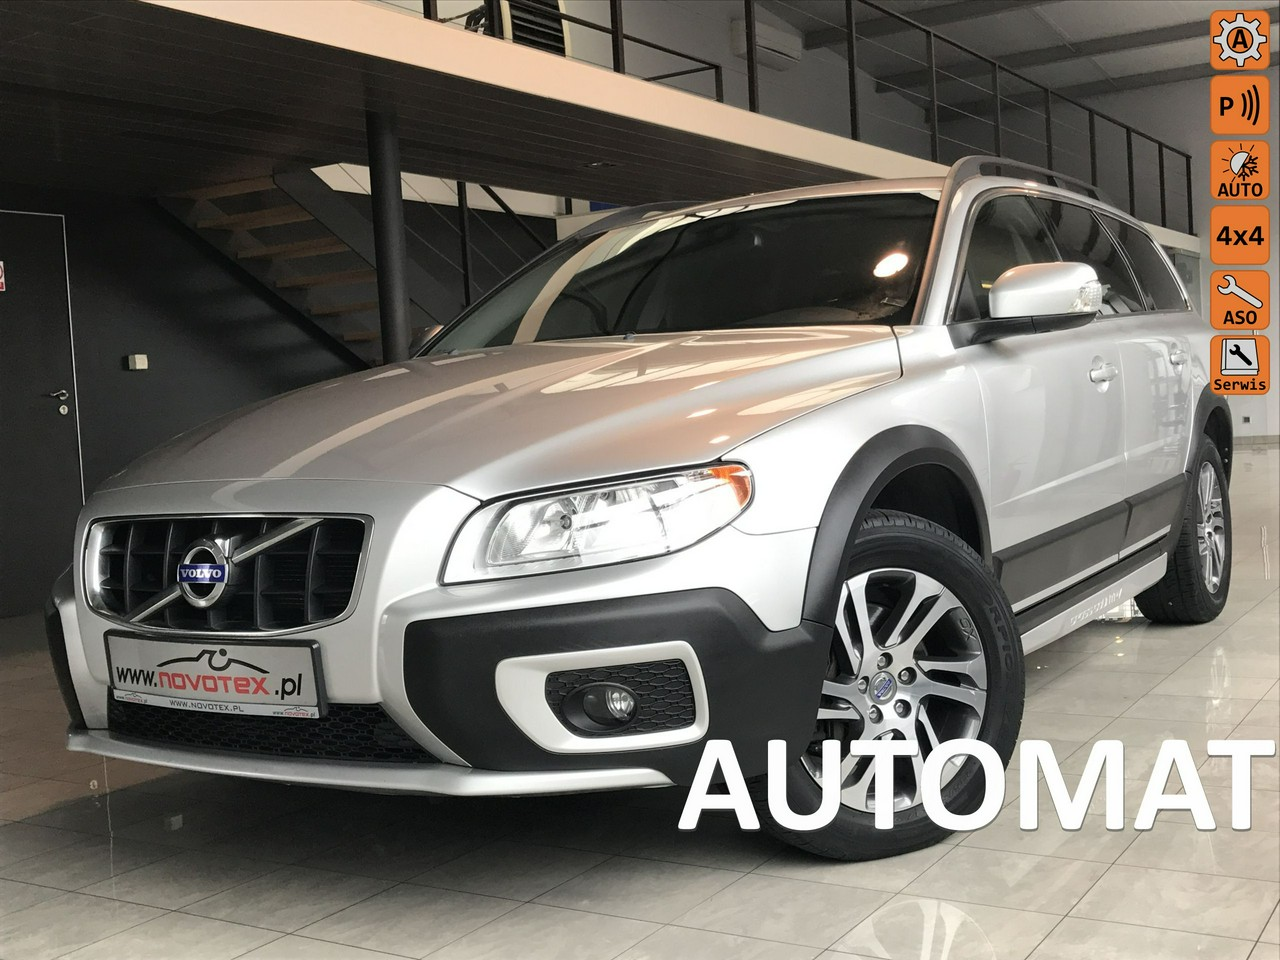 Volvo XC 70 D5*AWD*automat*187Tkm*lift 2011*serwis w ASO*Gwarancja VIP Gwarant